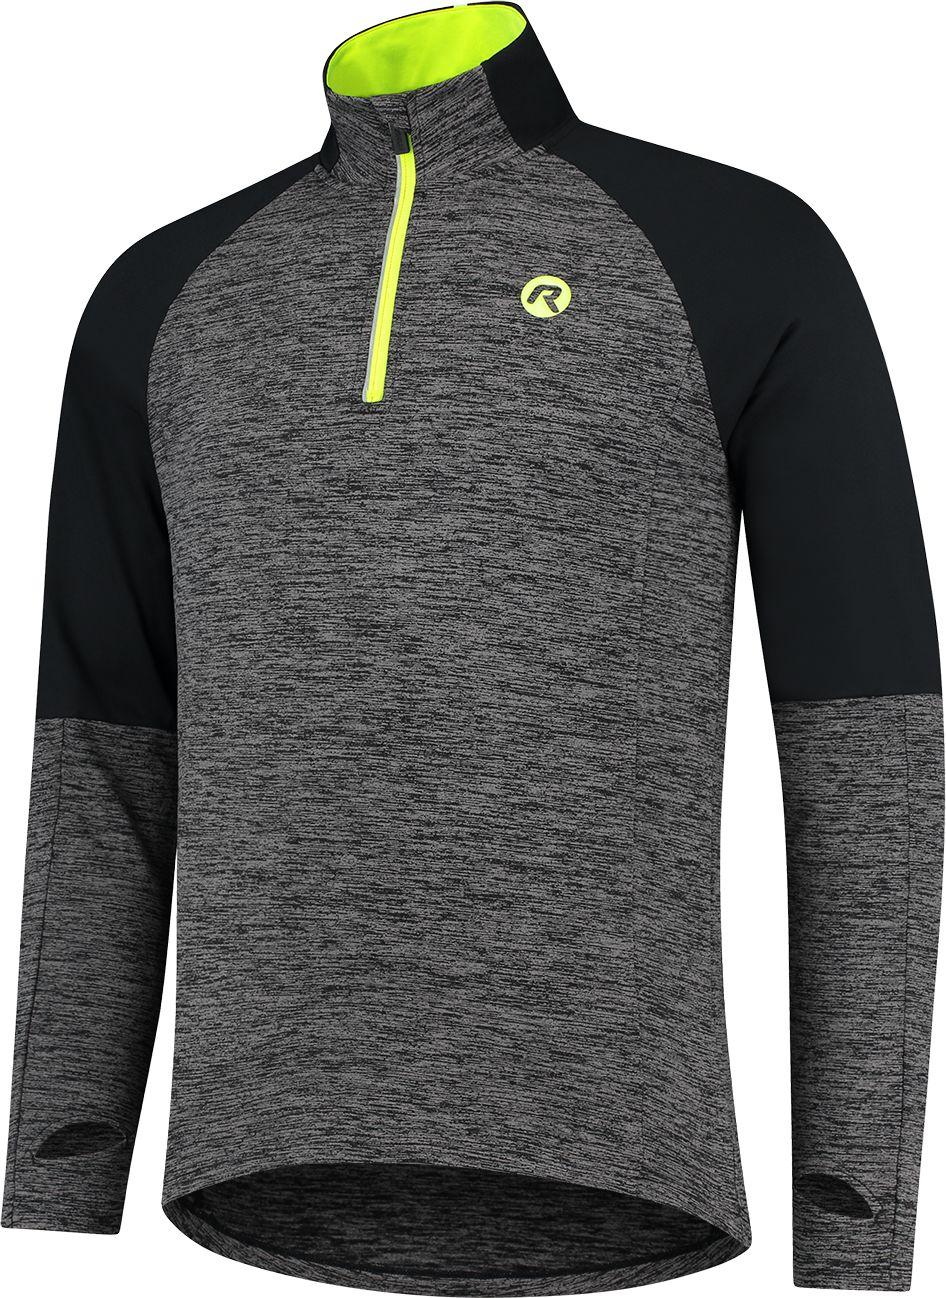 ROGELLI męska bluza do biegania ENJOY black/grey ROG351102 Rozmiar: L,ROG351102.S